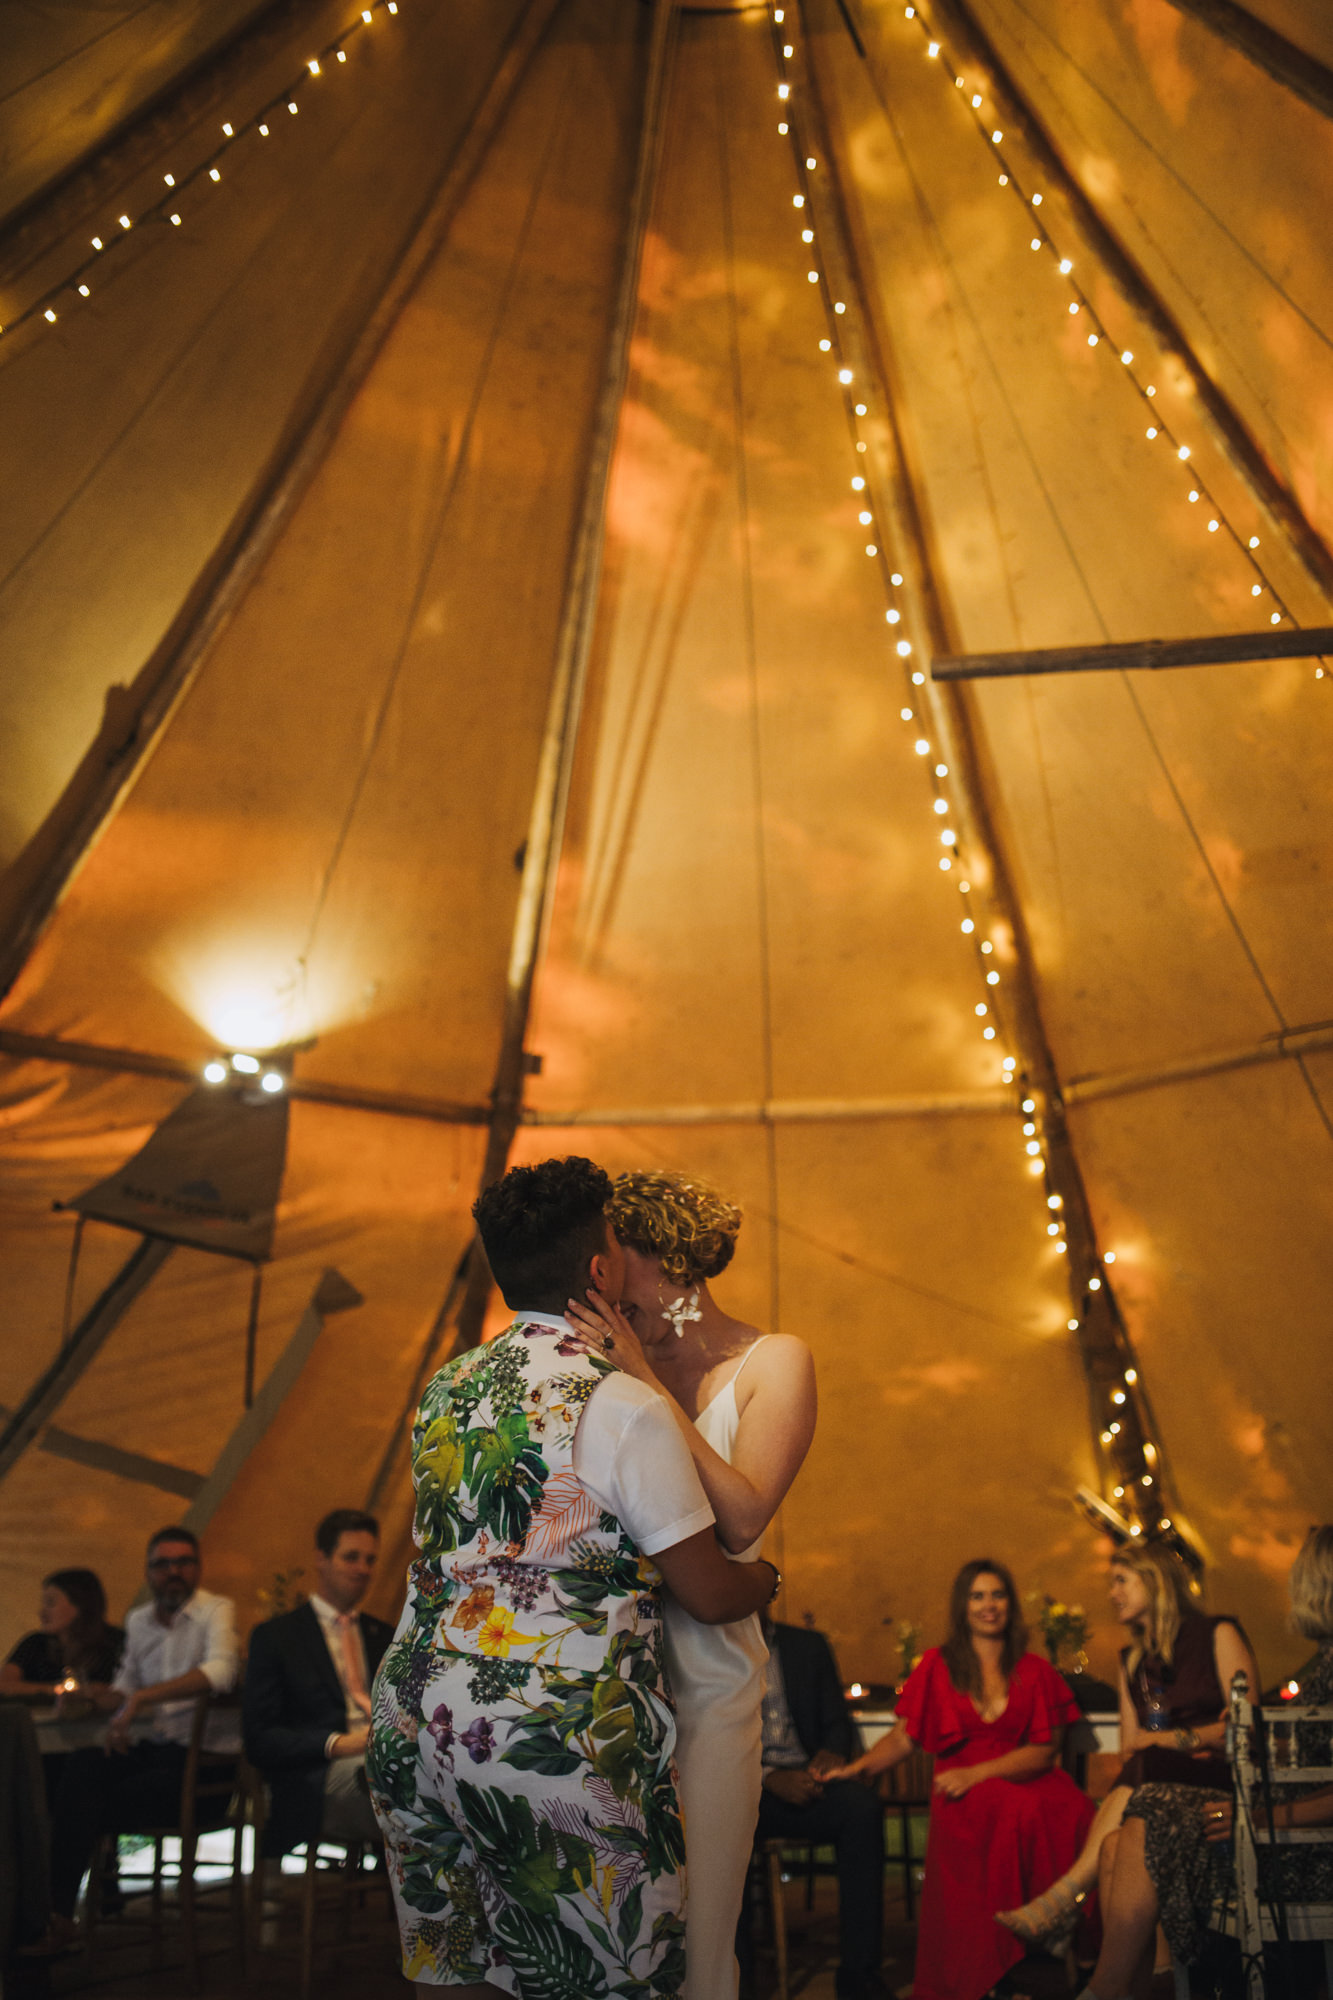 applewood wedding photographer leeds, yorkshire70.jpg